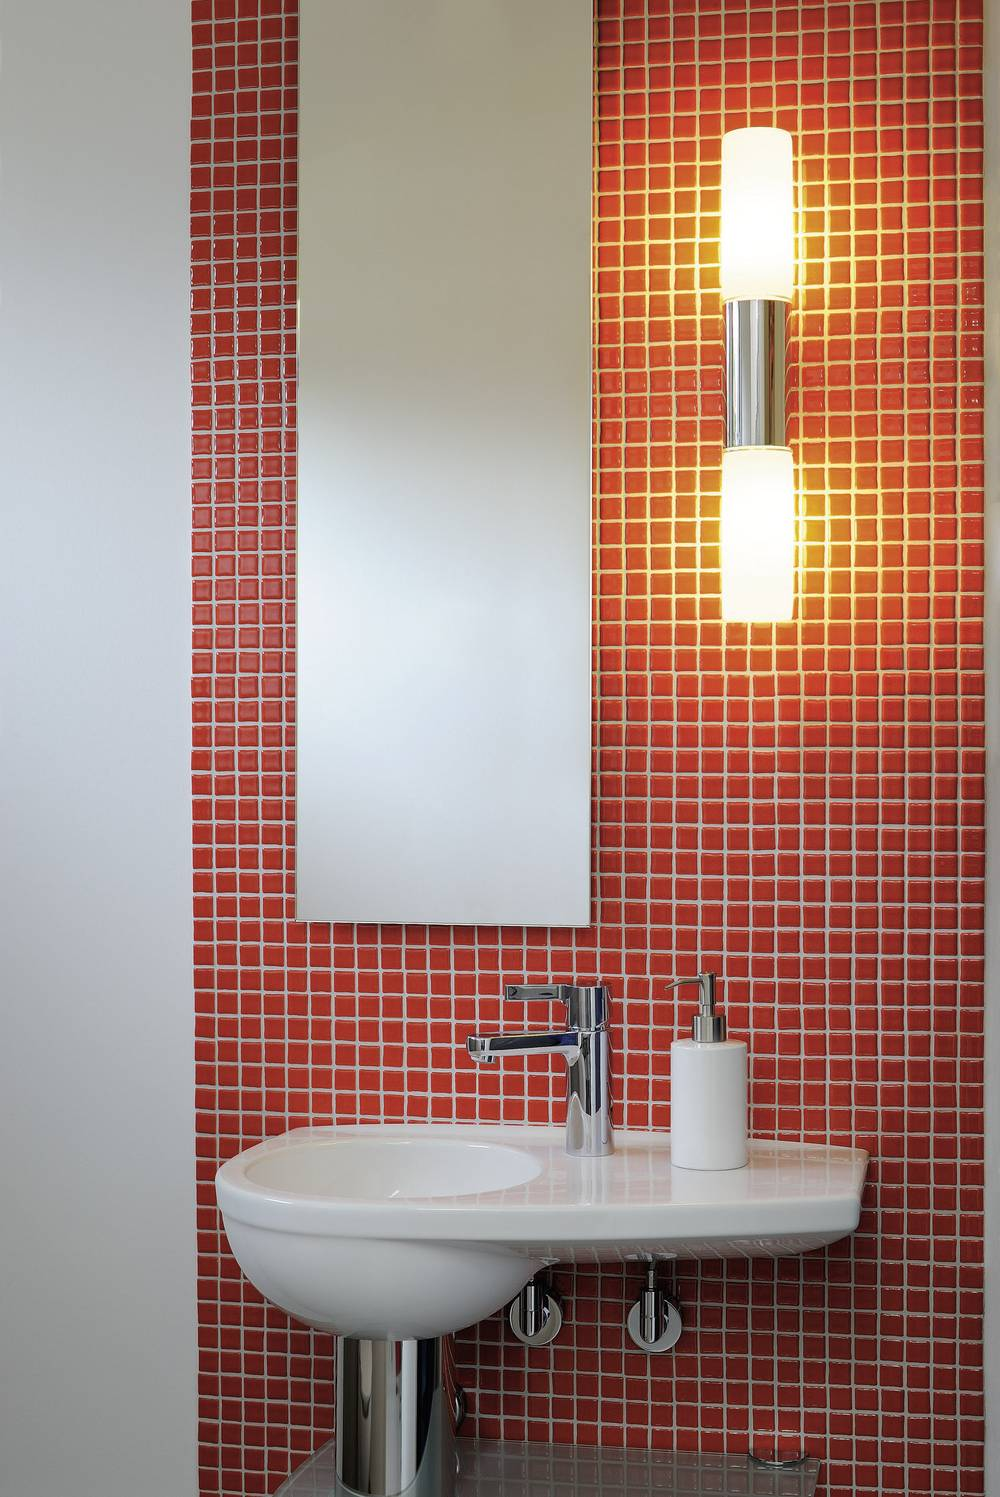 Slv Spot Salle De Bain ~ applique murale pour salle de bain slv devin double e14 22 w chrome